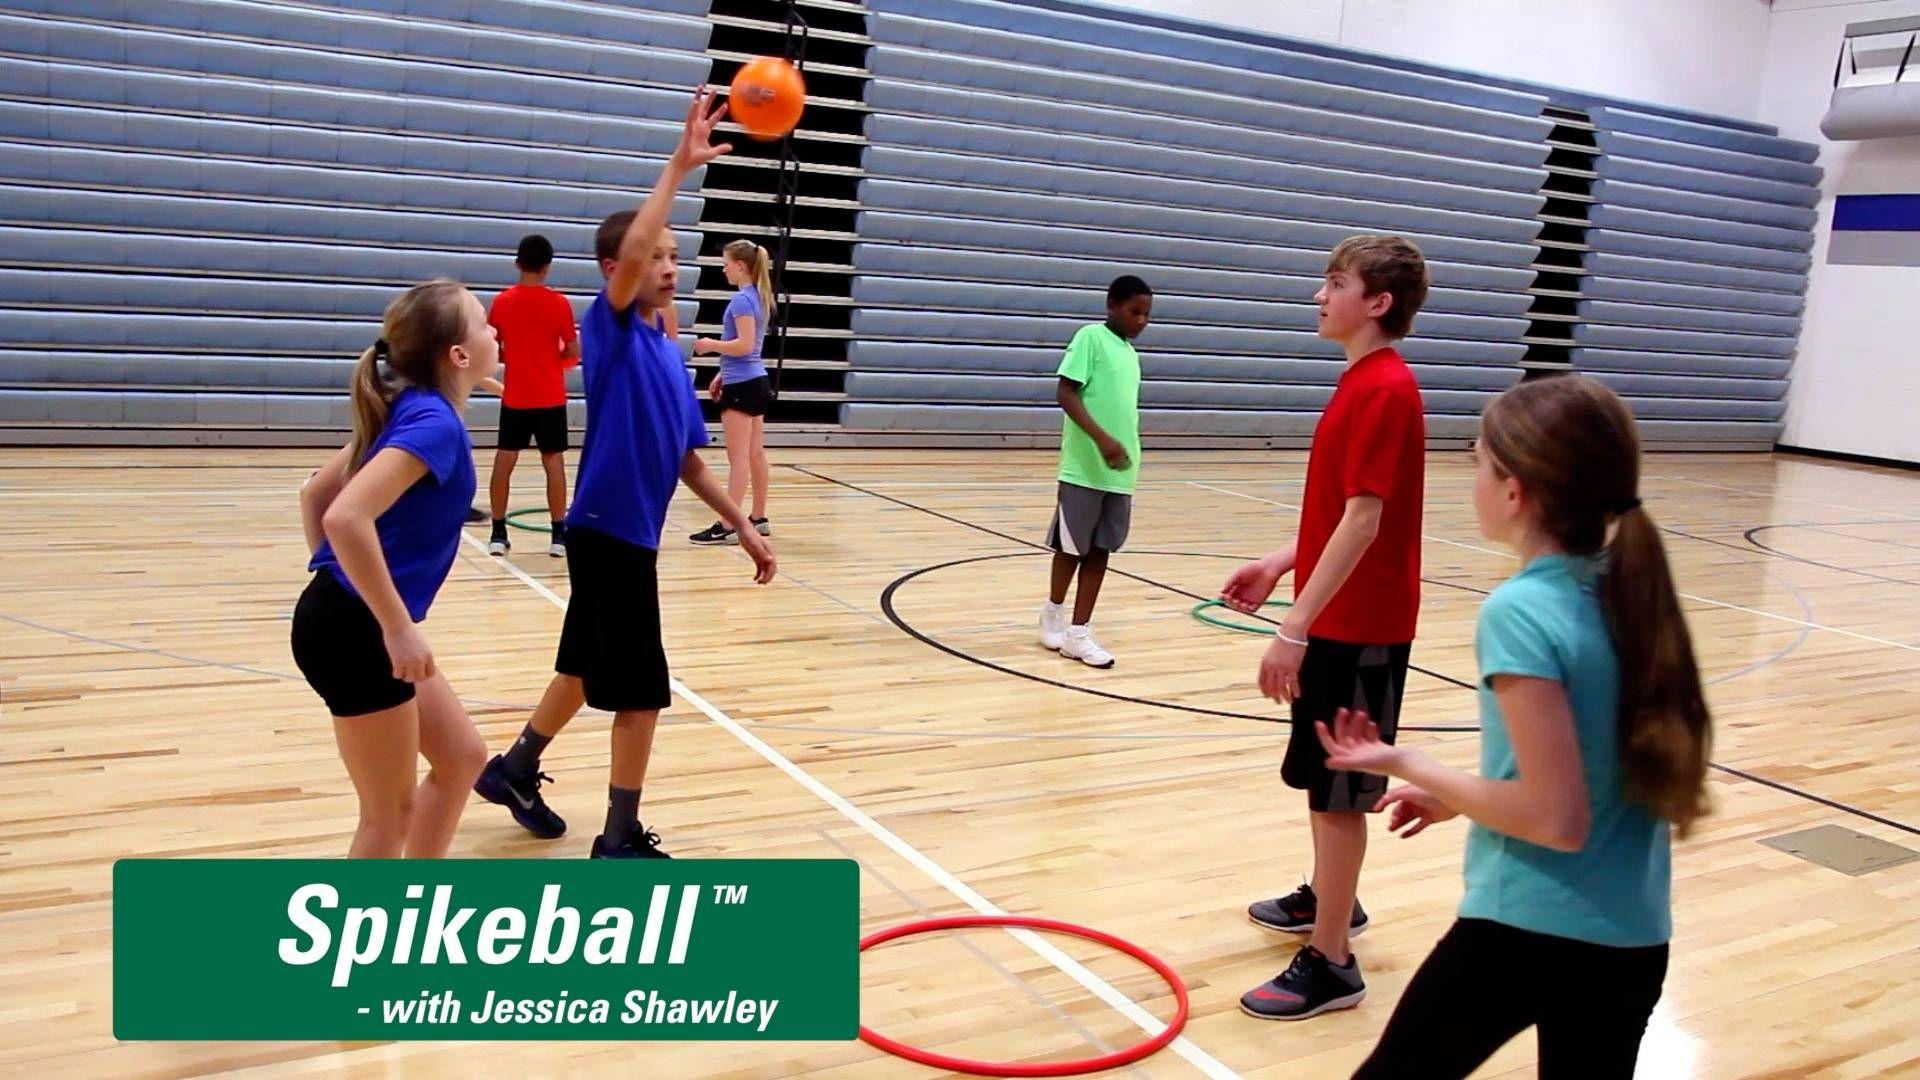 Обои warm-up, physical activity outdoors. Спорт foto 7